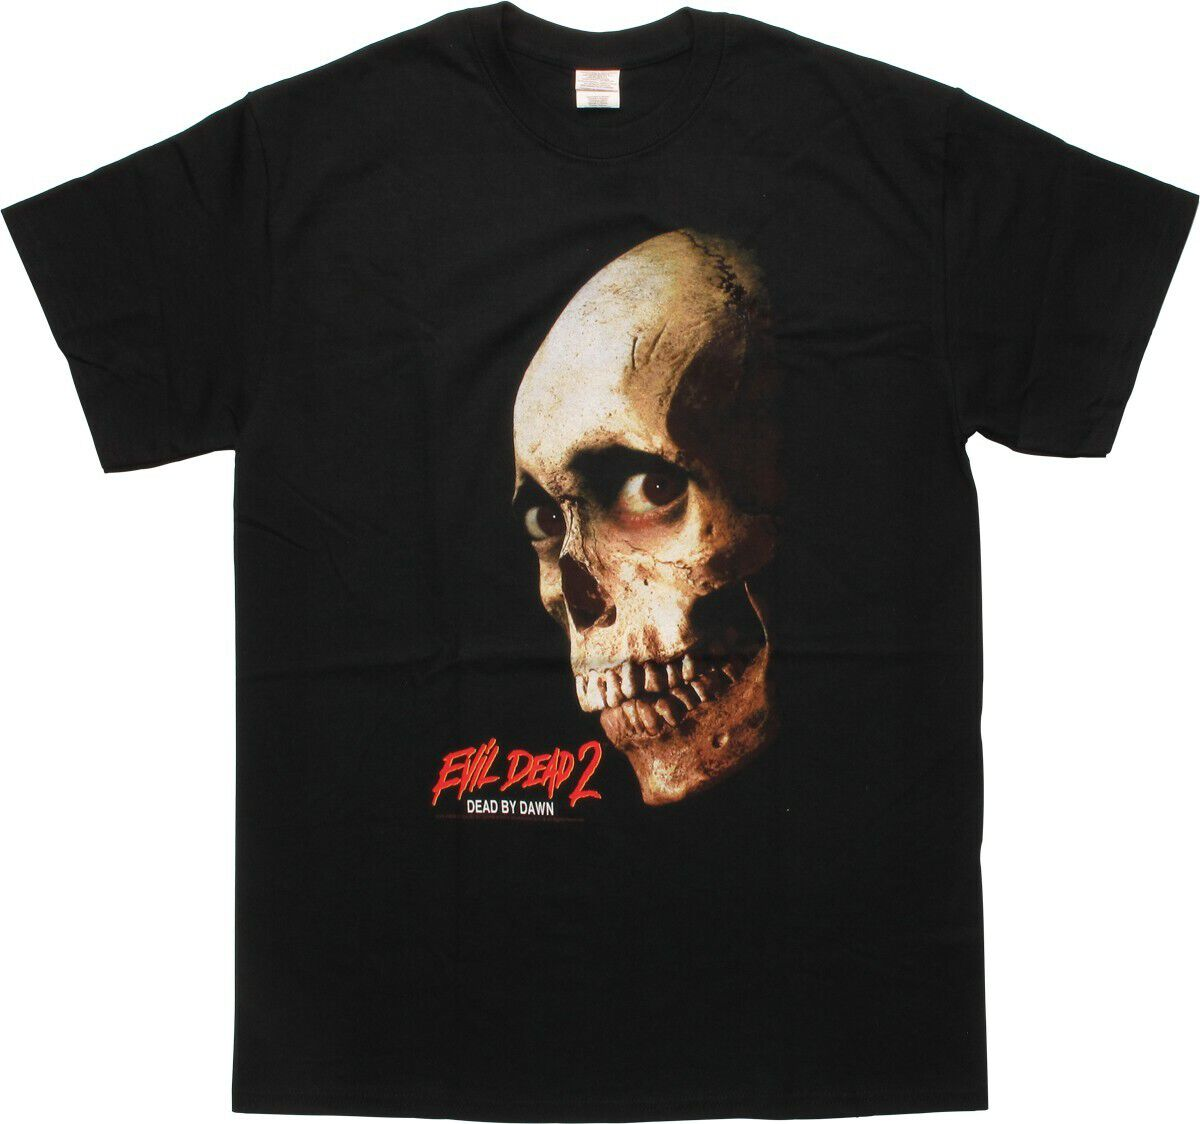 Evil Dead 2 Dead By Dawn Poster T-Shirt